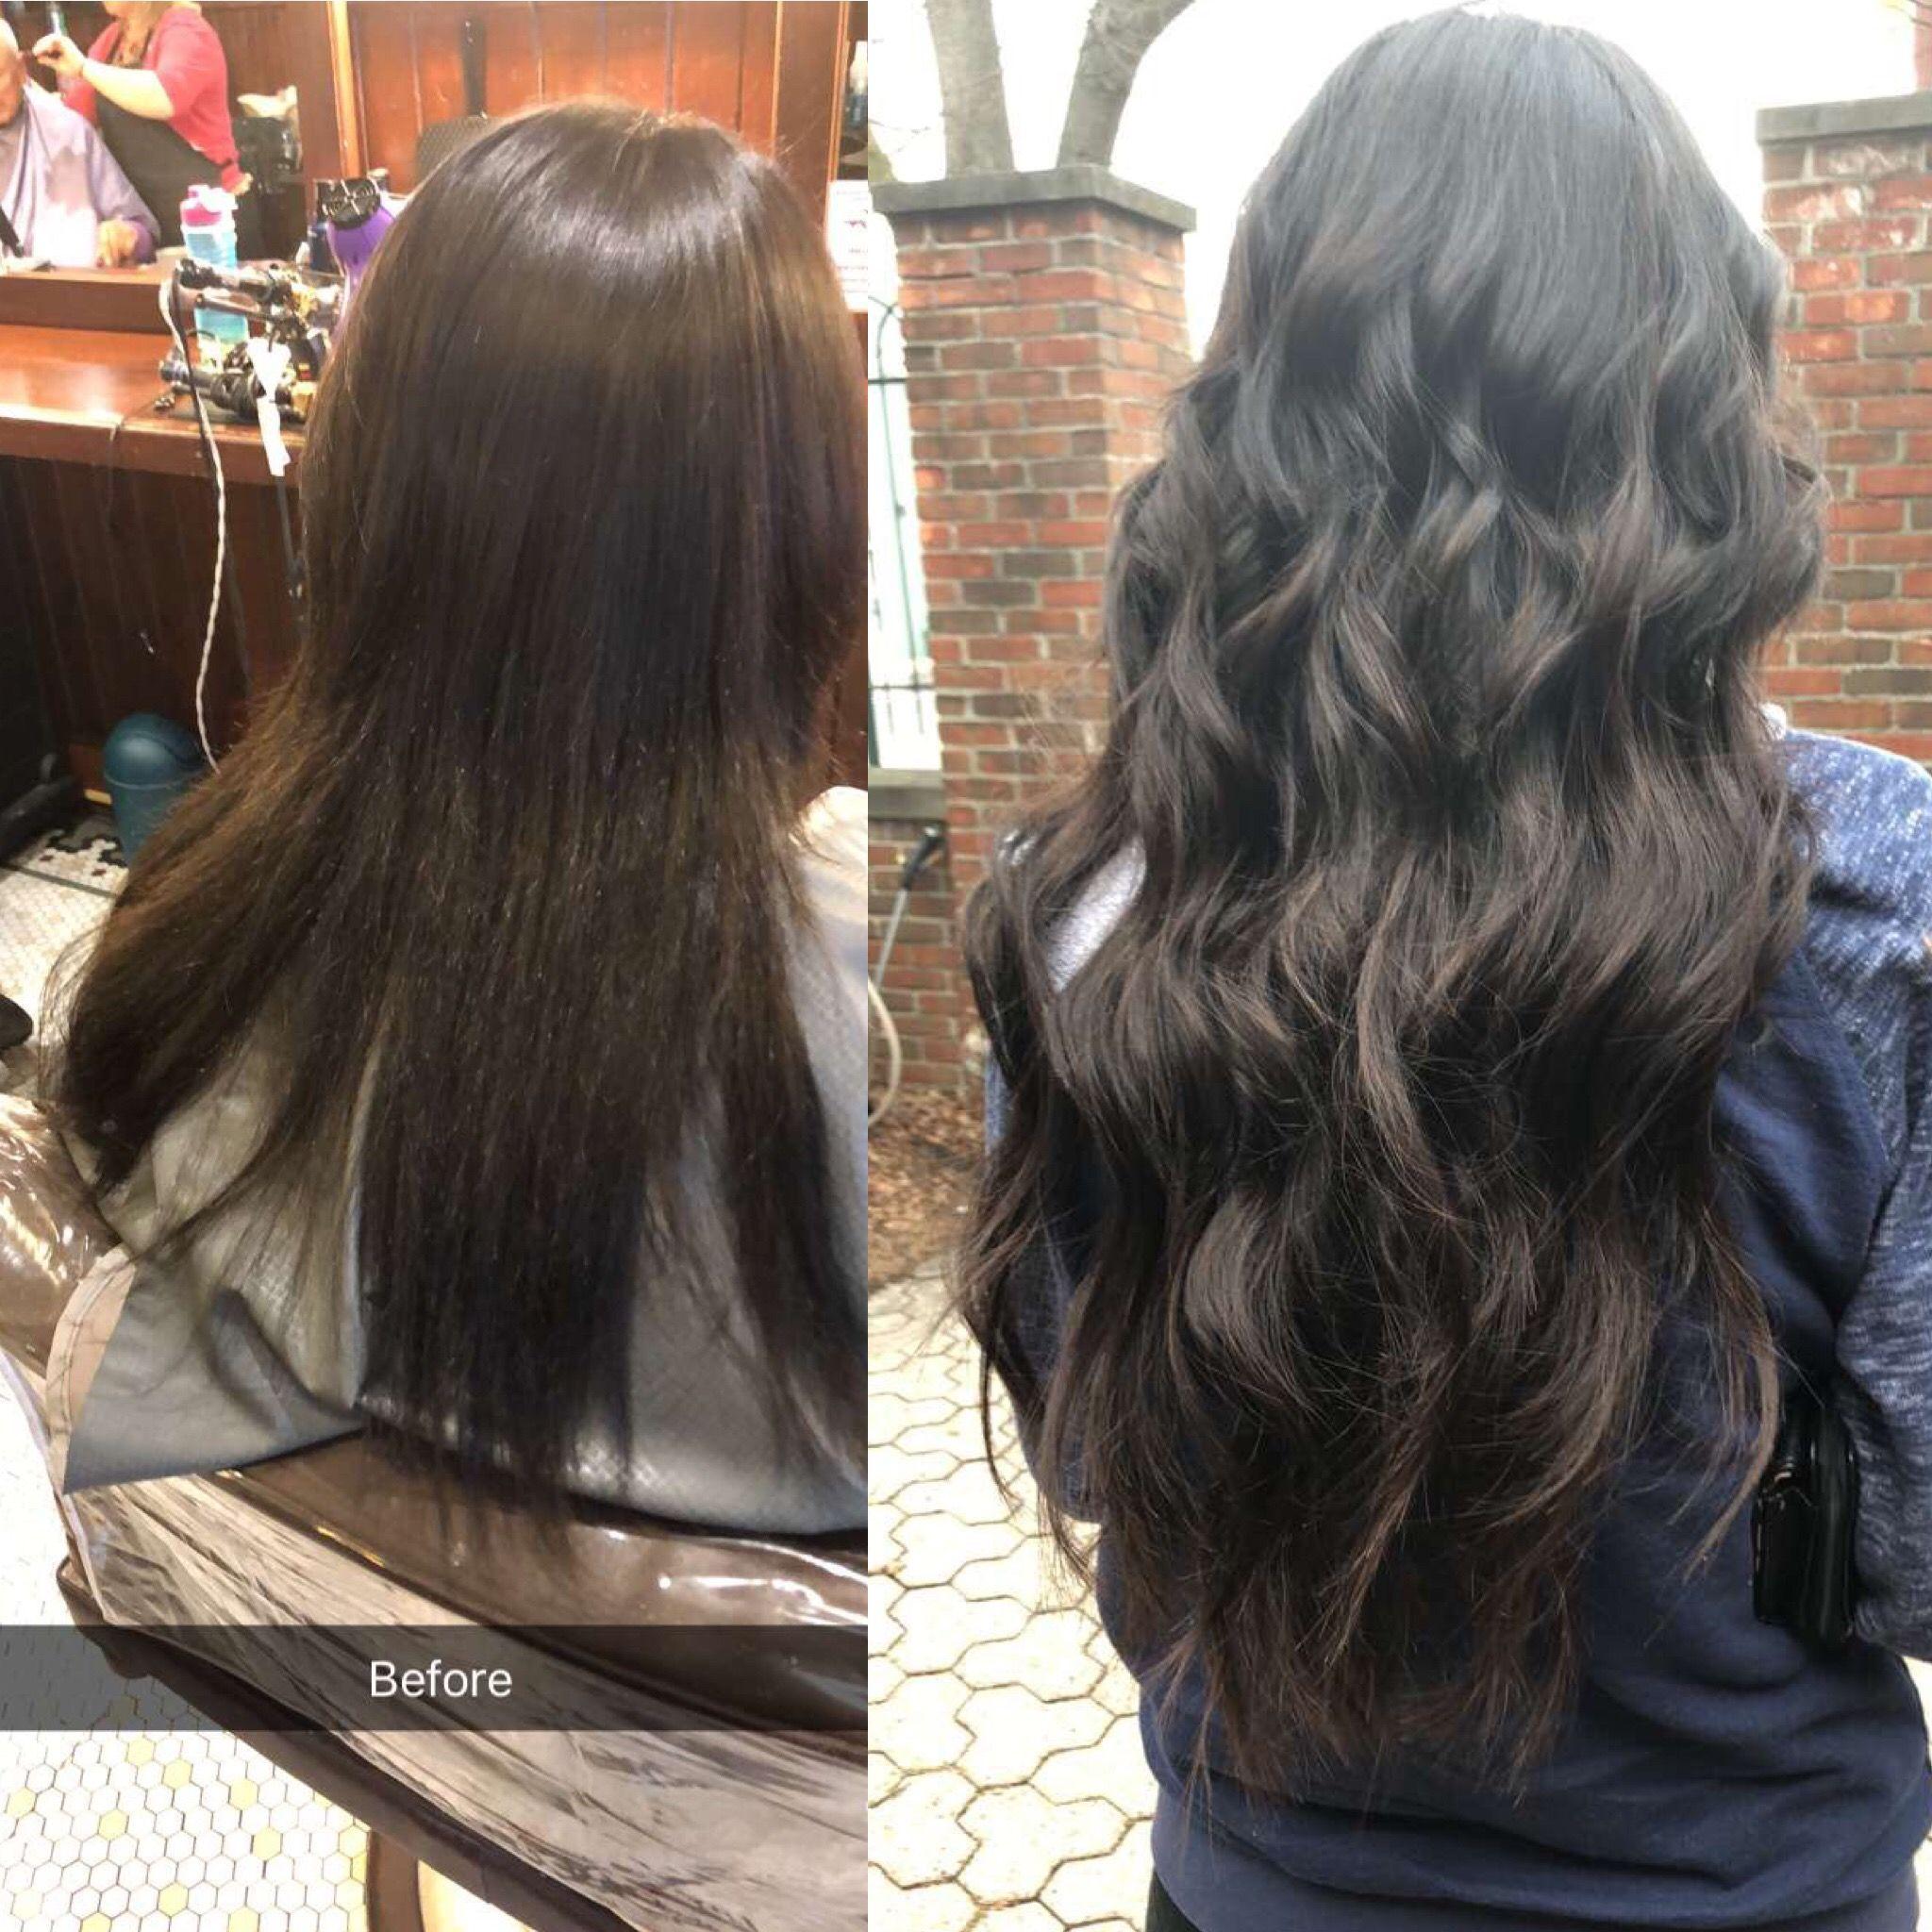 Klix Extensions In 22 Inch Long Hair Styles Hair Styles Hair